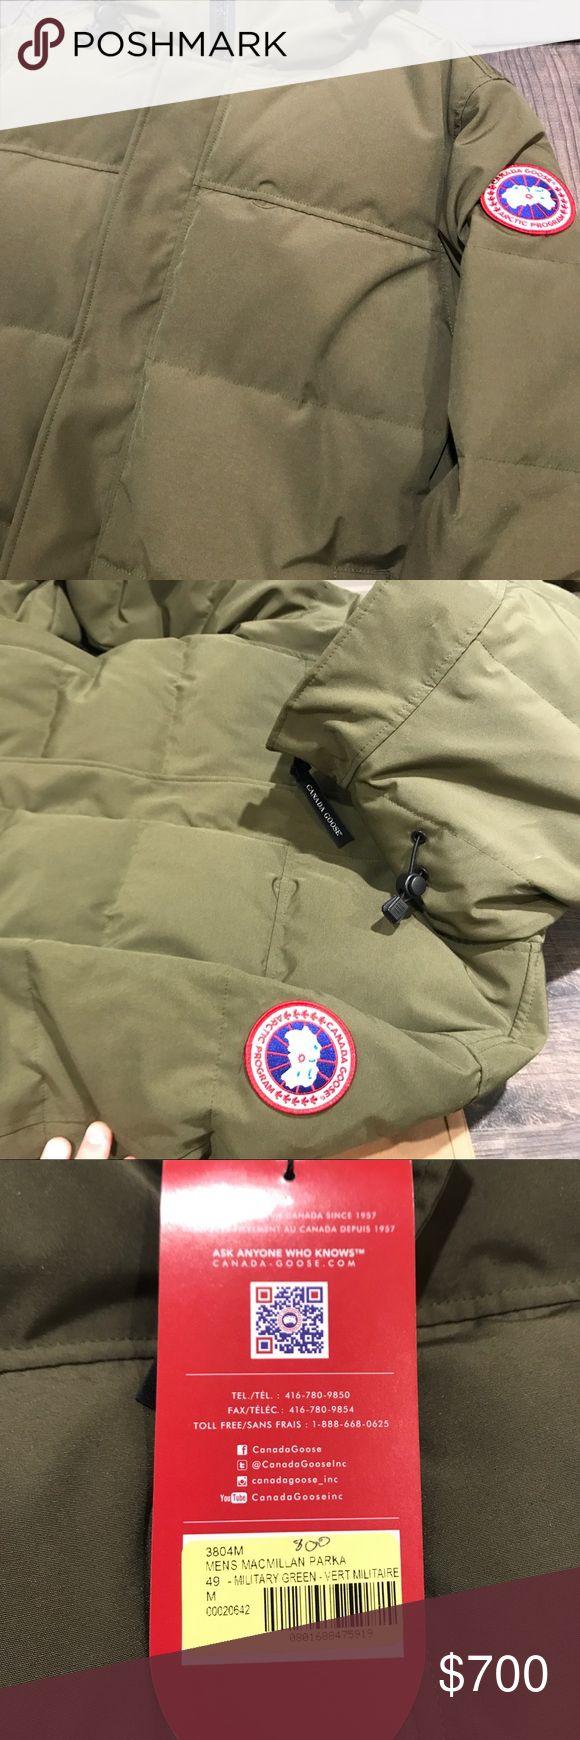 McMillan Parka Canada Goose: Military Green New With Tags McMillan Parka: Military Green Canada Goose Jackets & Coats